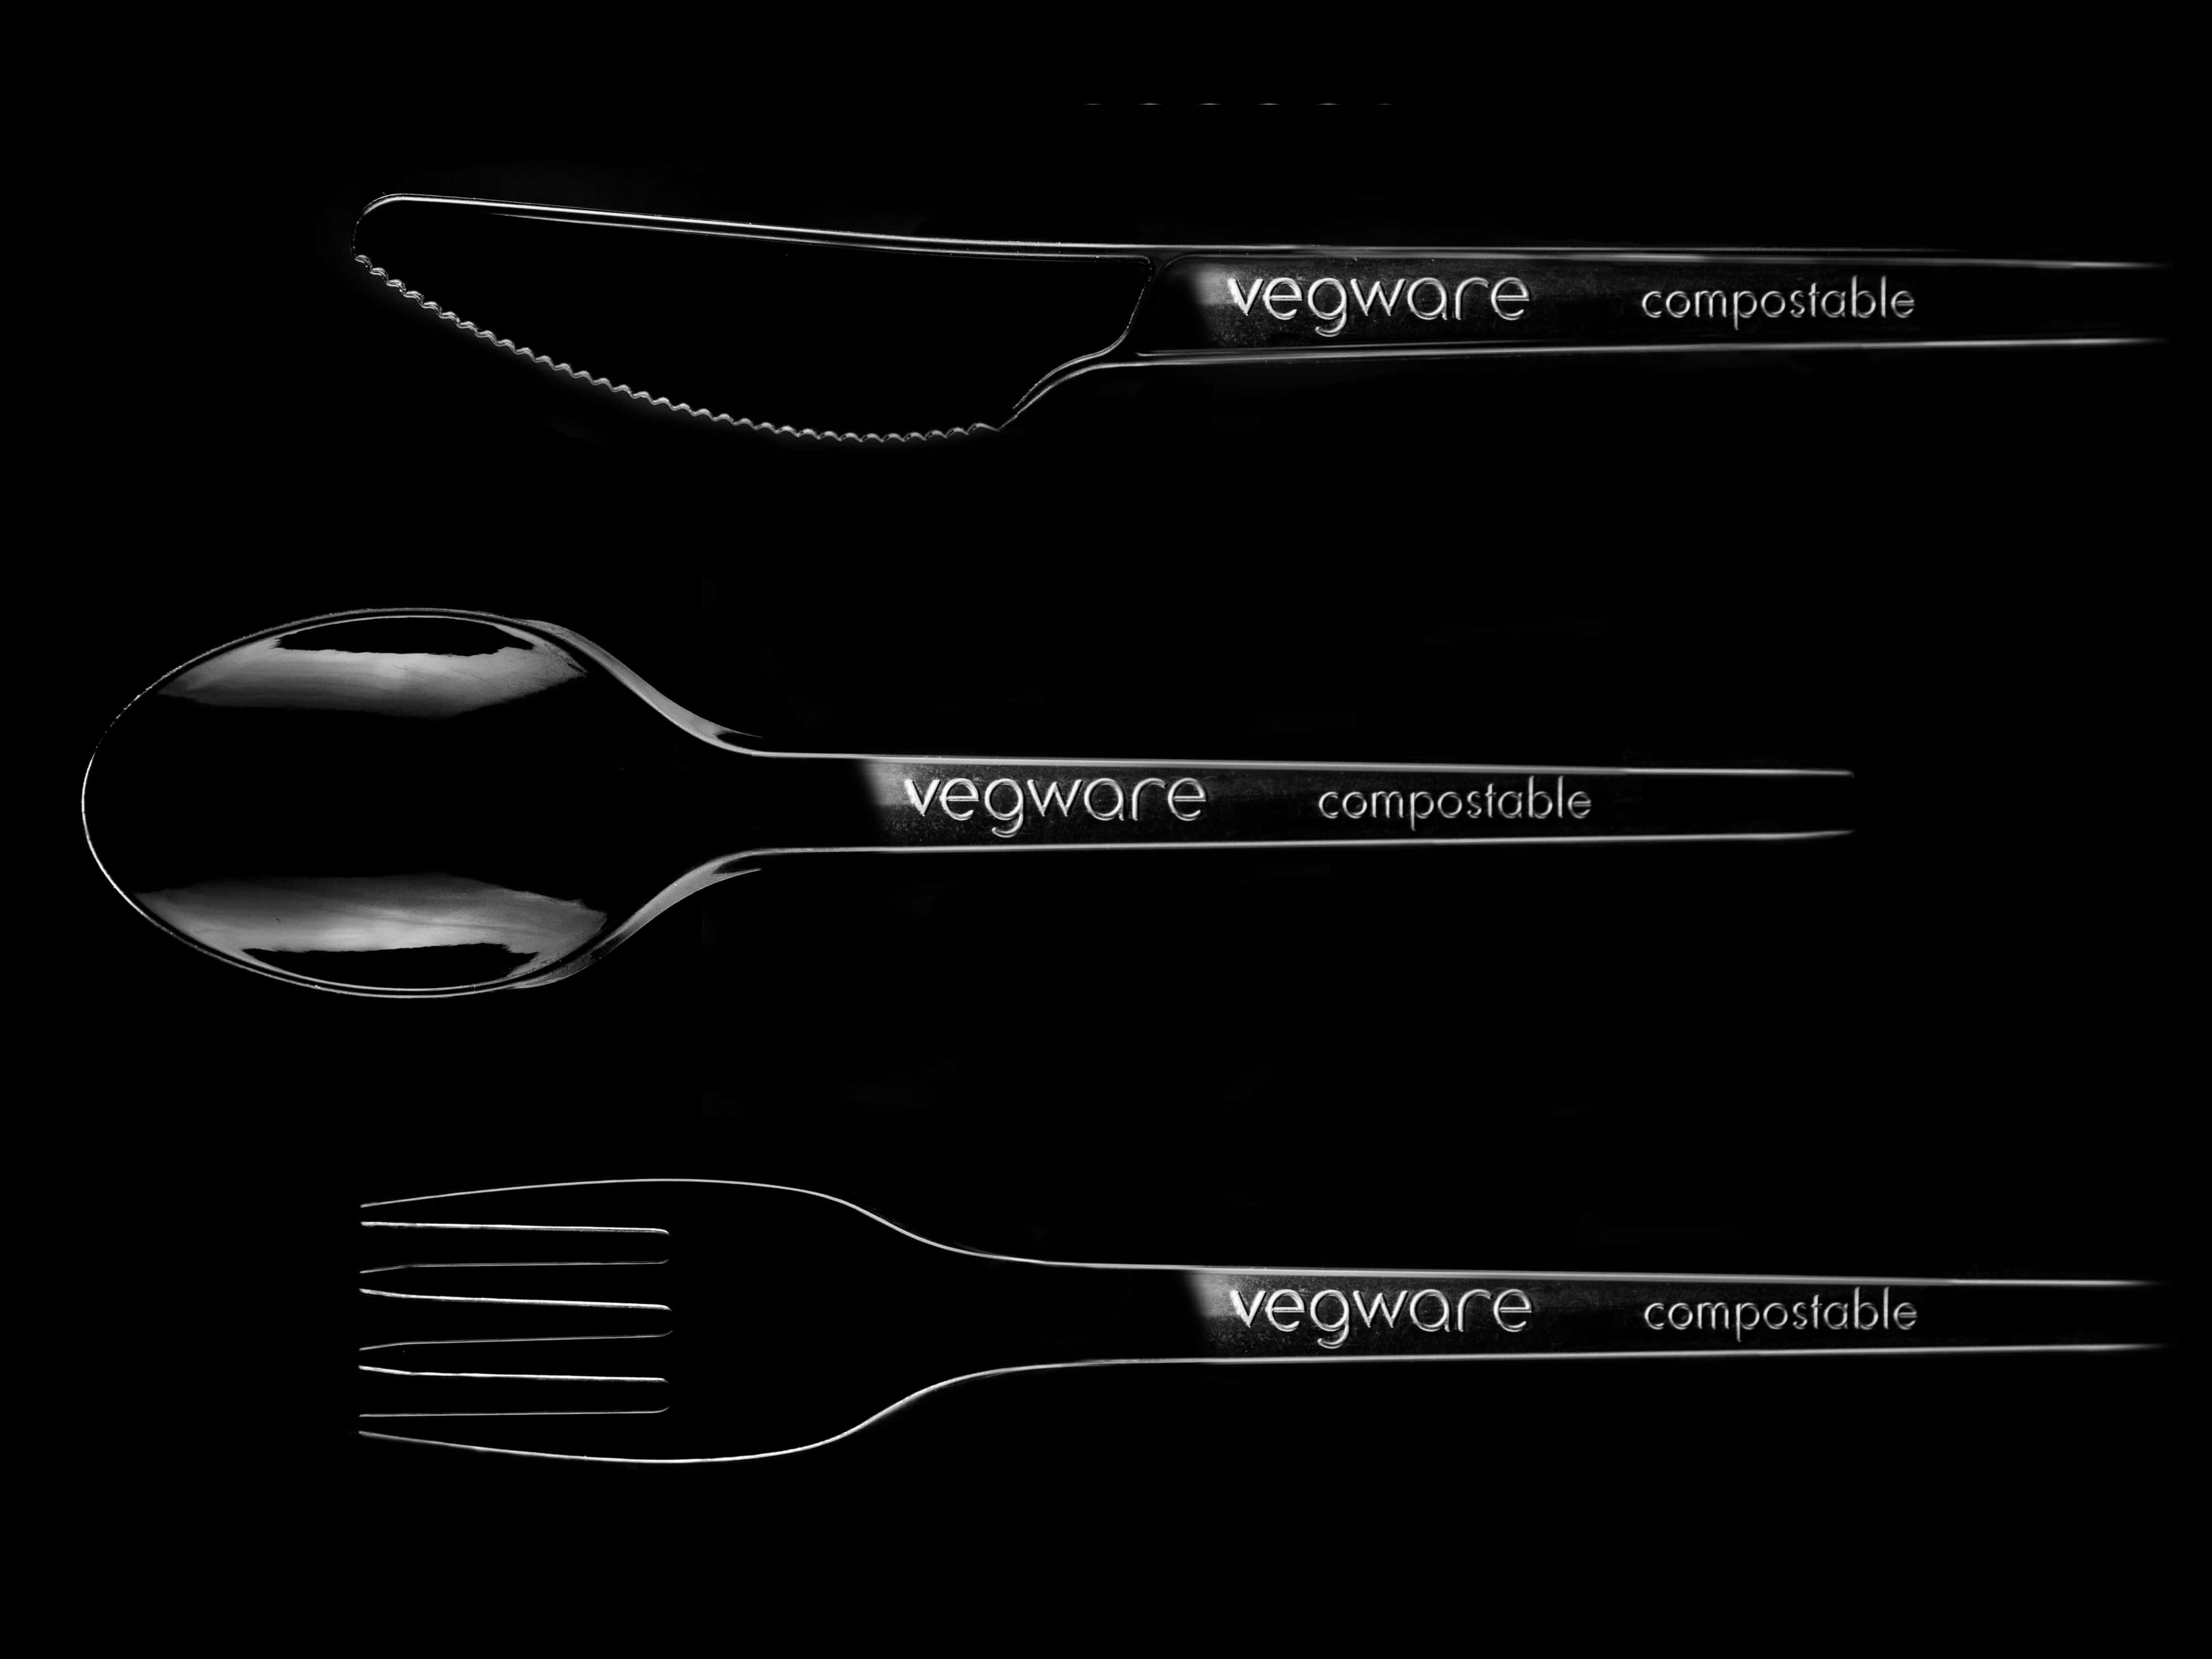 Vegware concept cutlery VR SPFKKN6.5 straight 1504